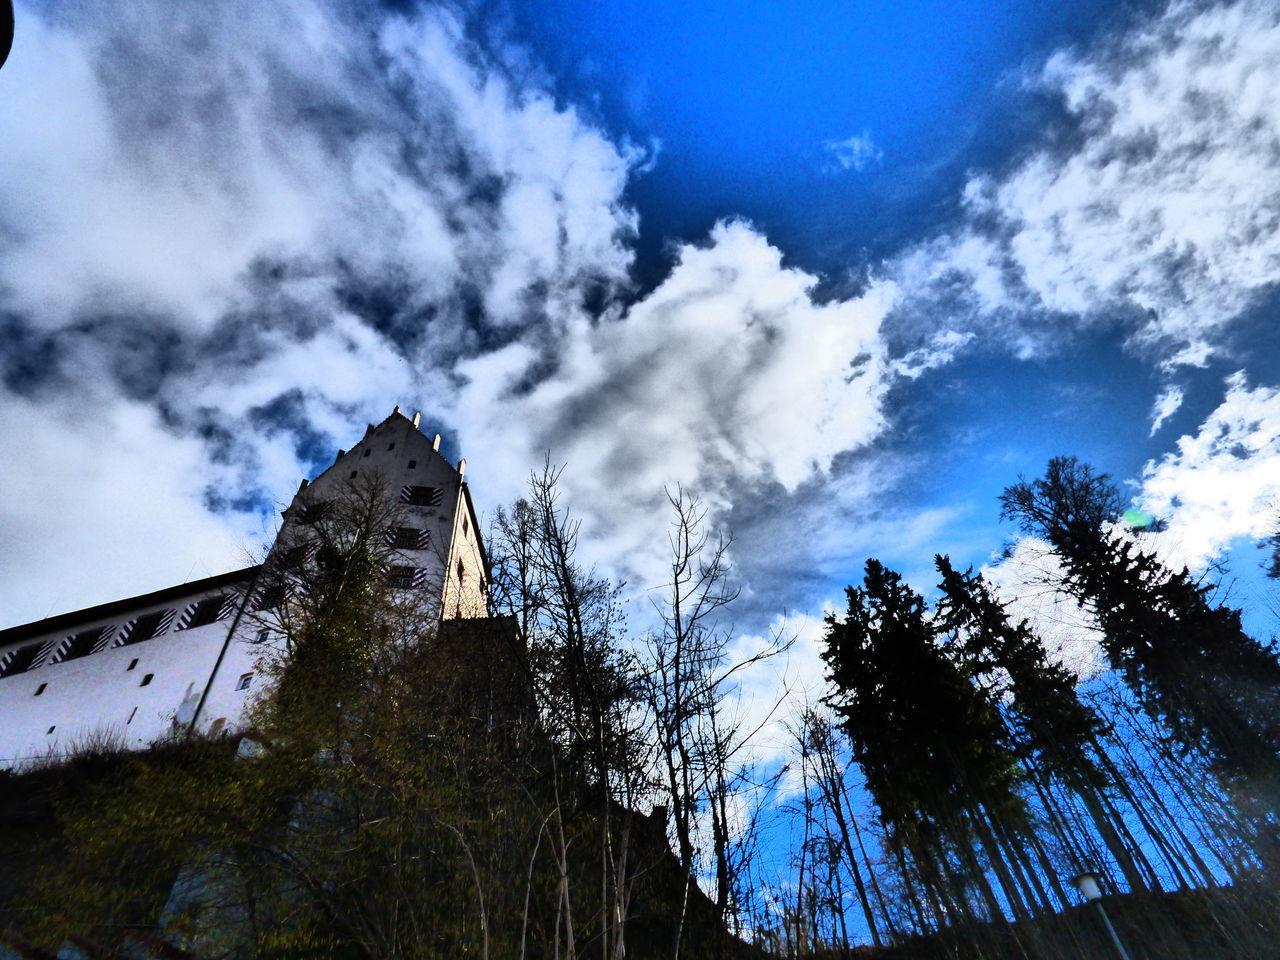 Building Exterior Cloudy Füssen, Bayern, Deutschland Hohen Schloss Holidays Sky Travelling Trees